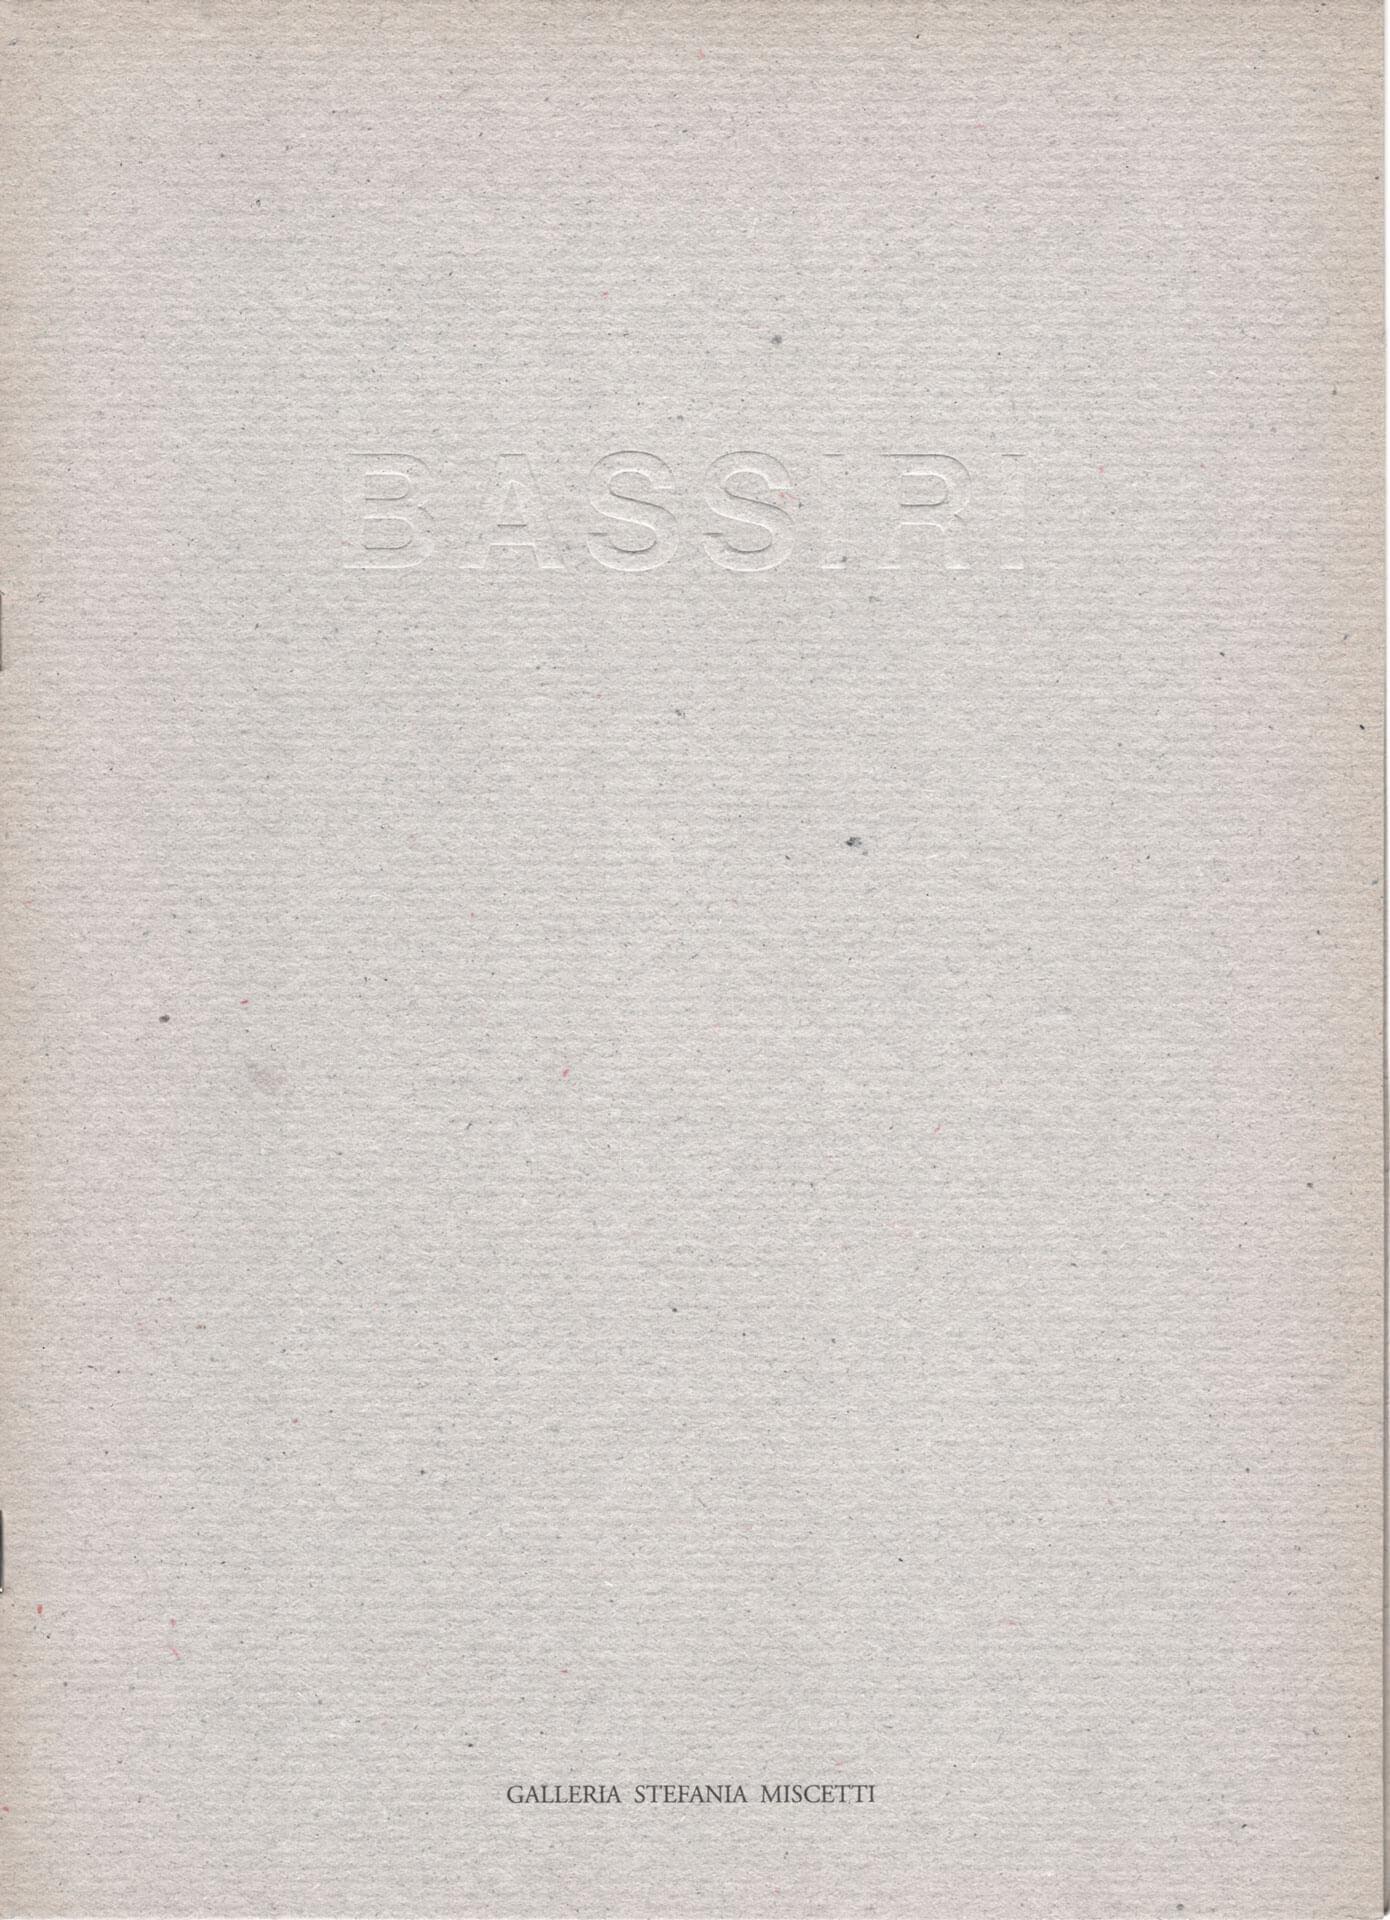 Studio Stefania Miscetti | Catalogues | Bizhan Bassiri | Battaglia di centauri